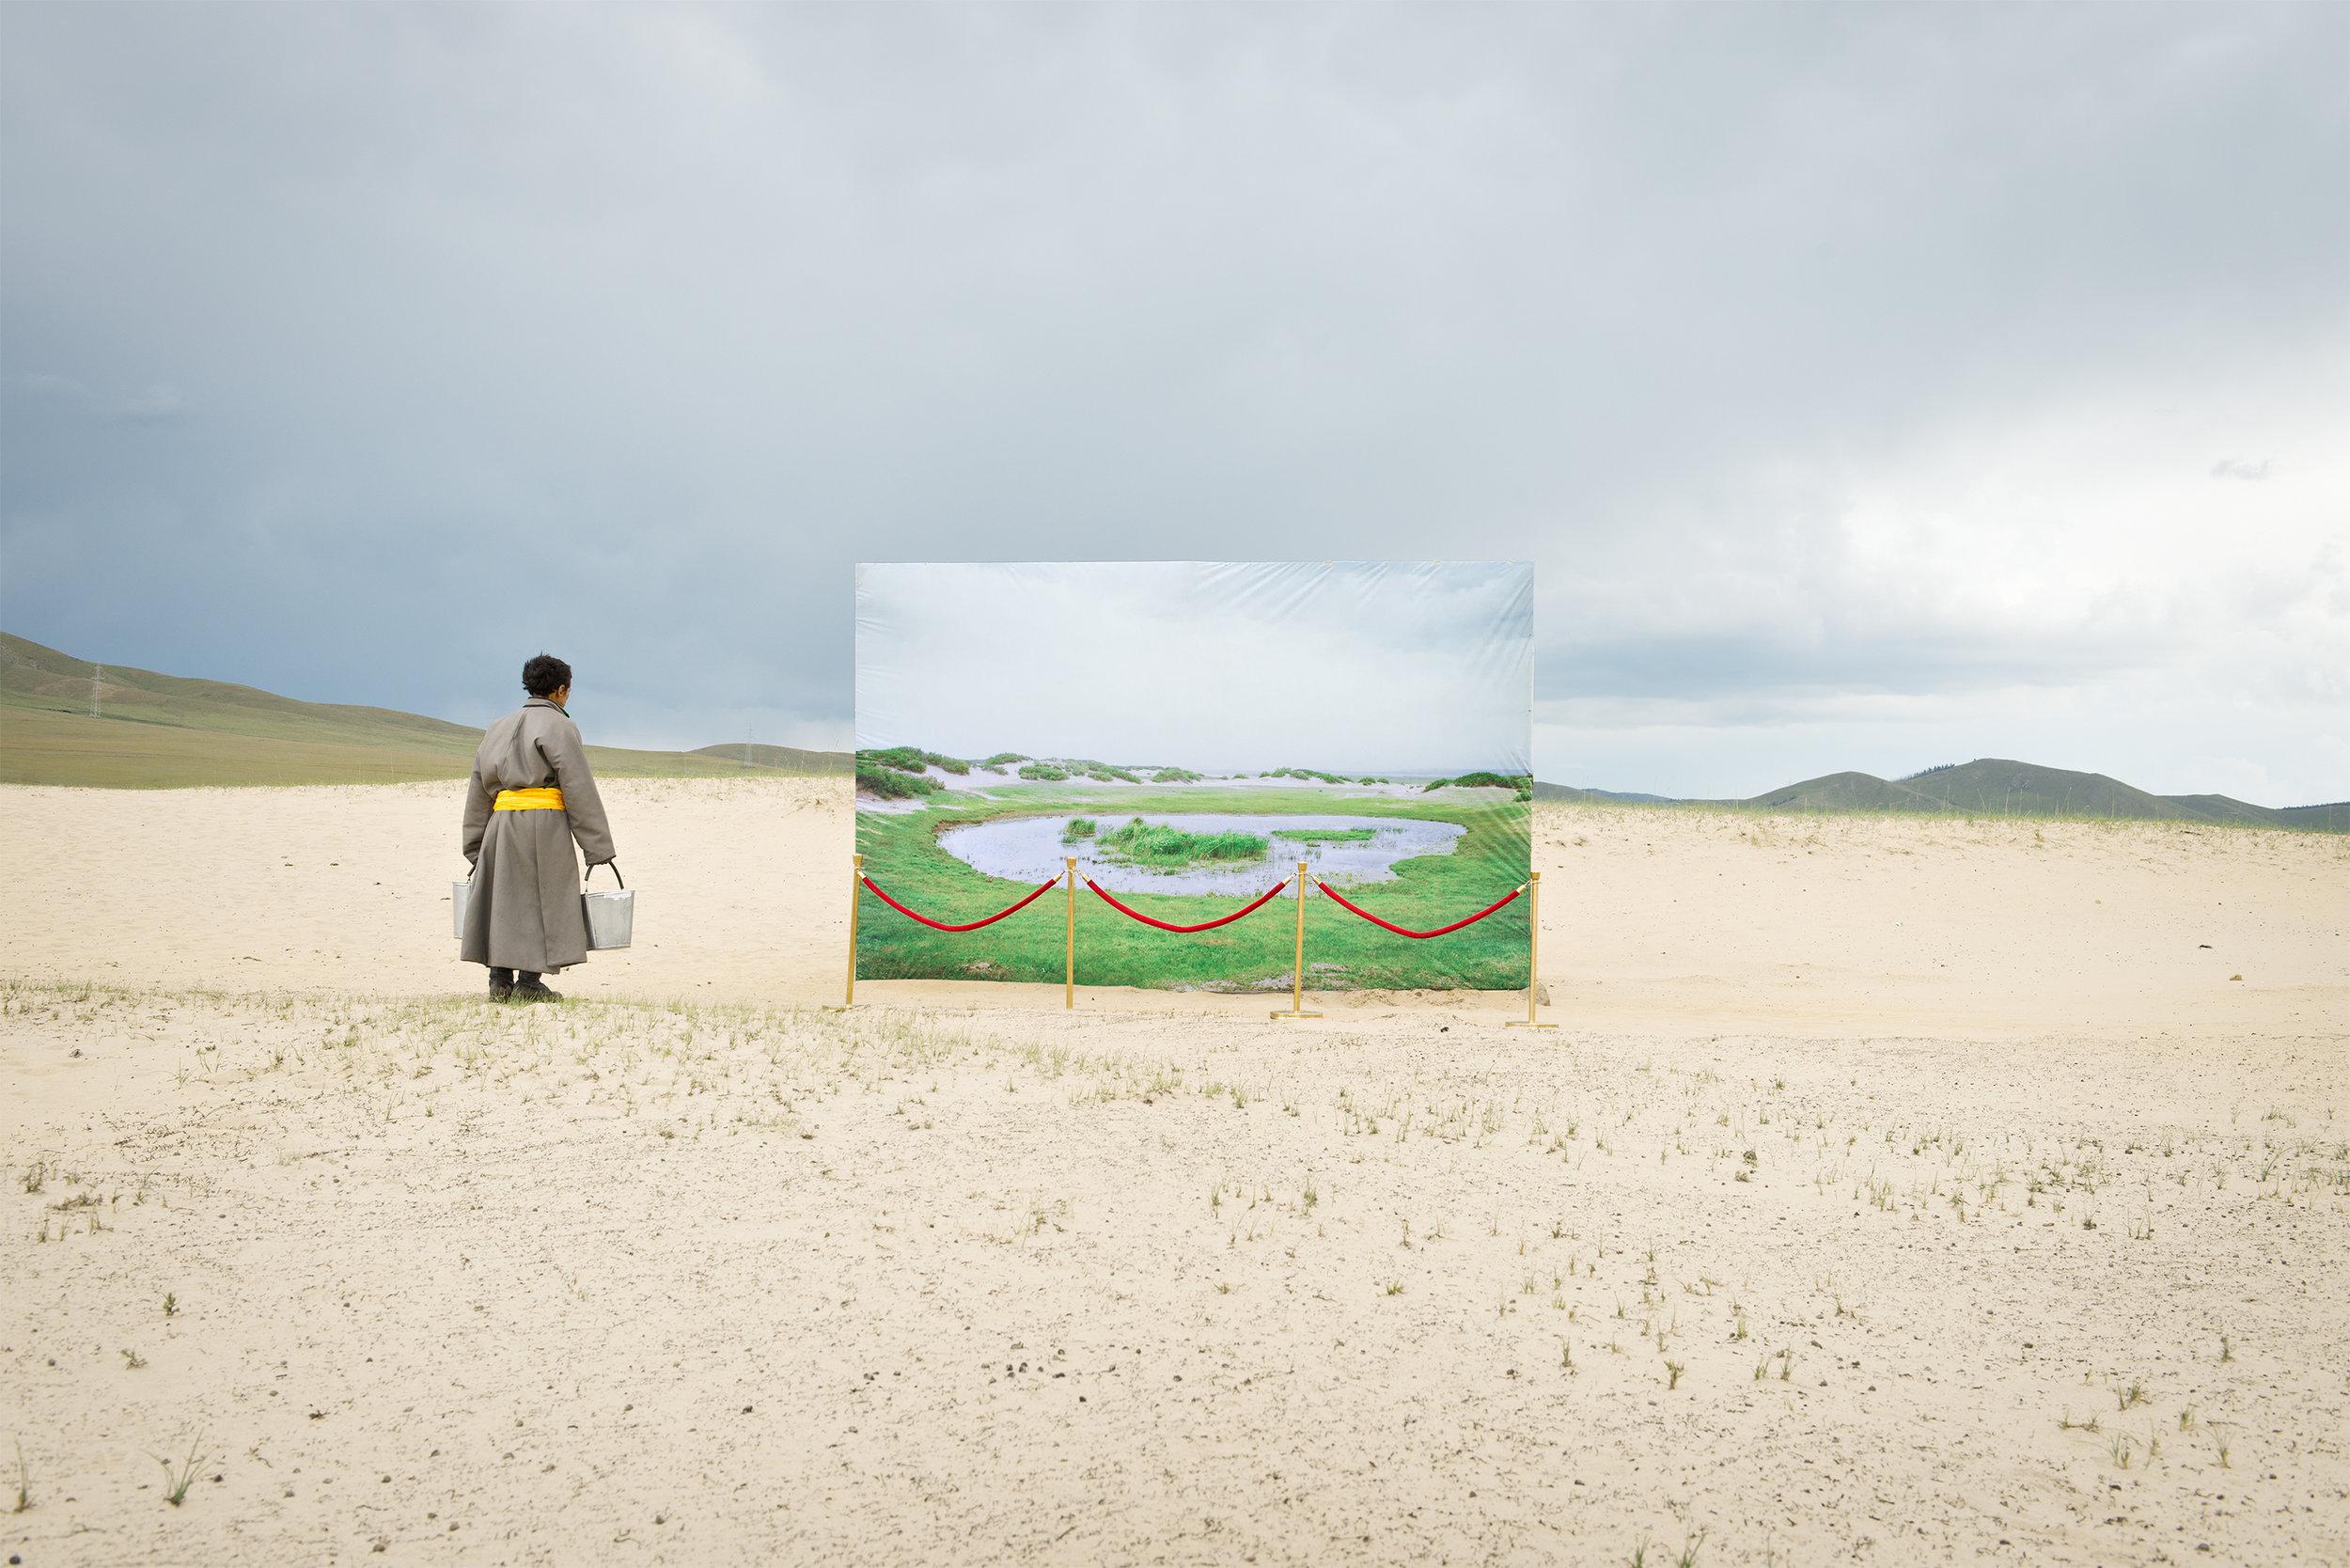 12 Daesung Lee futuristic archaeology  2014 South Korea.jpg